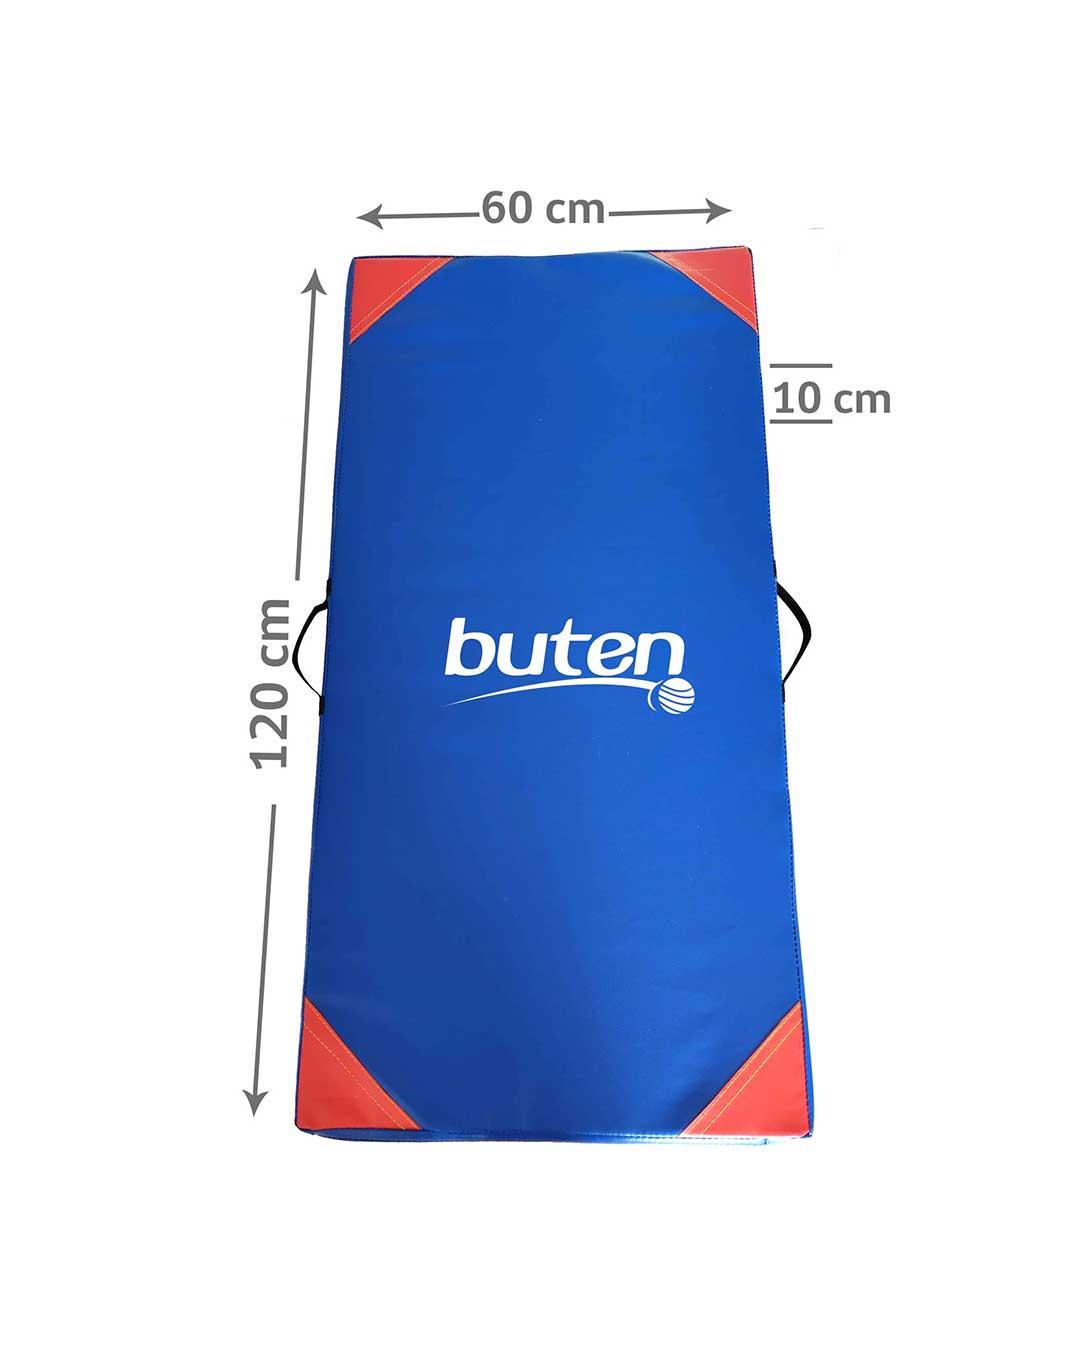 Colchoneta deportiva (120x60x10cm) marca BUTEN - XPRO 120 - Chile